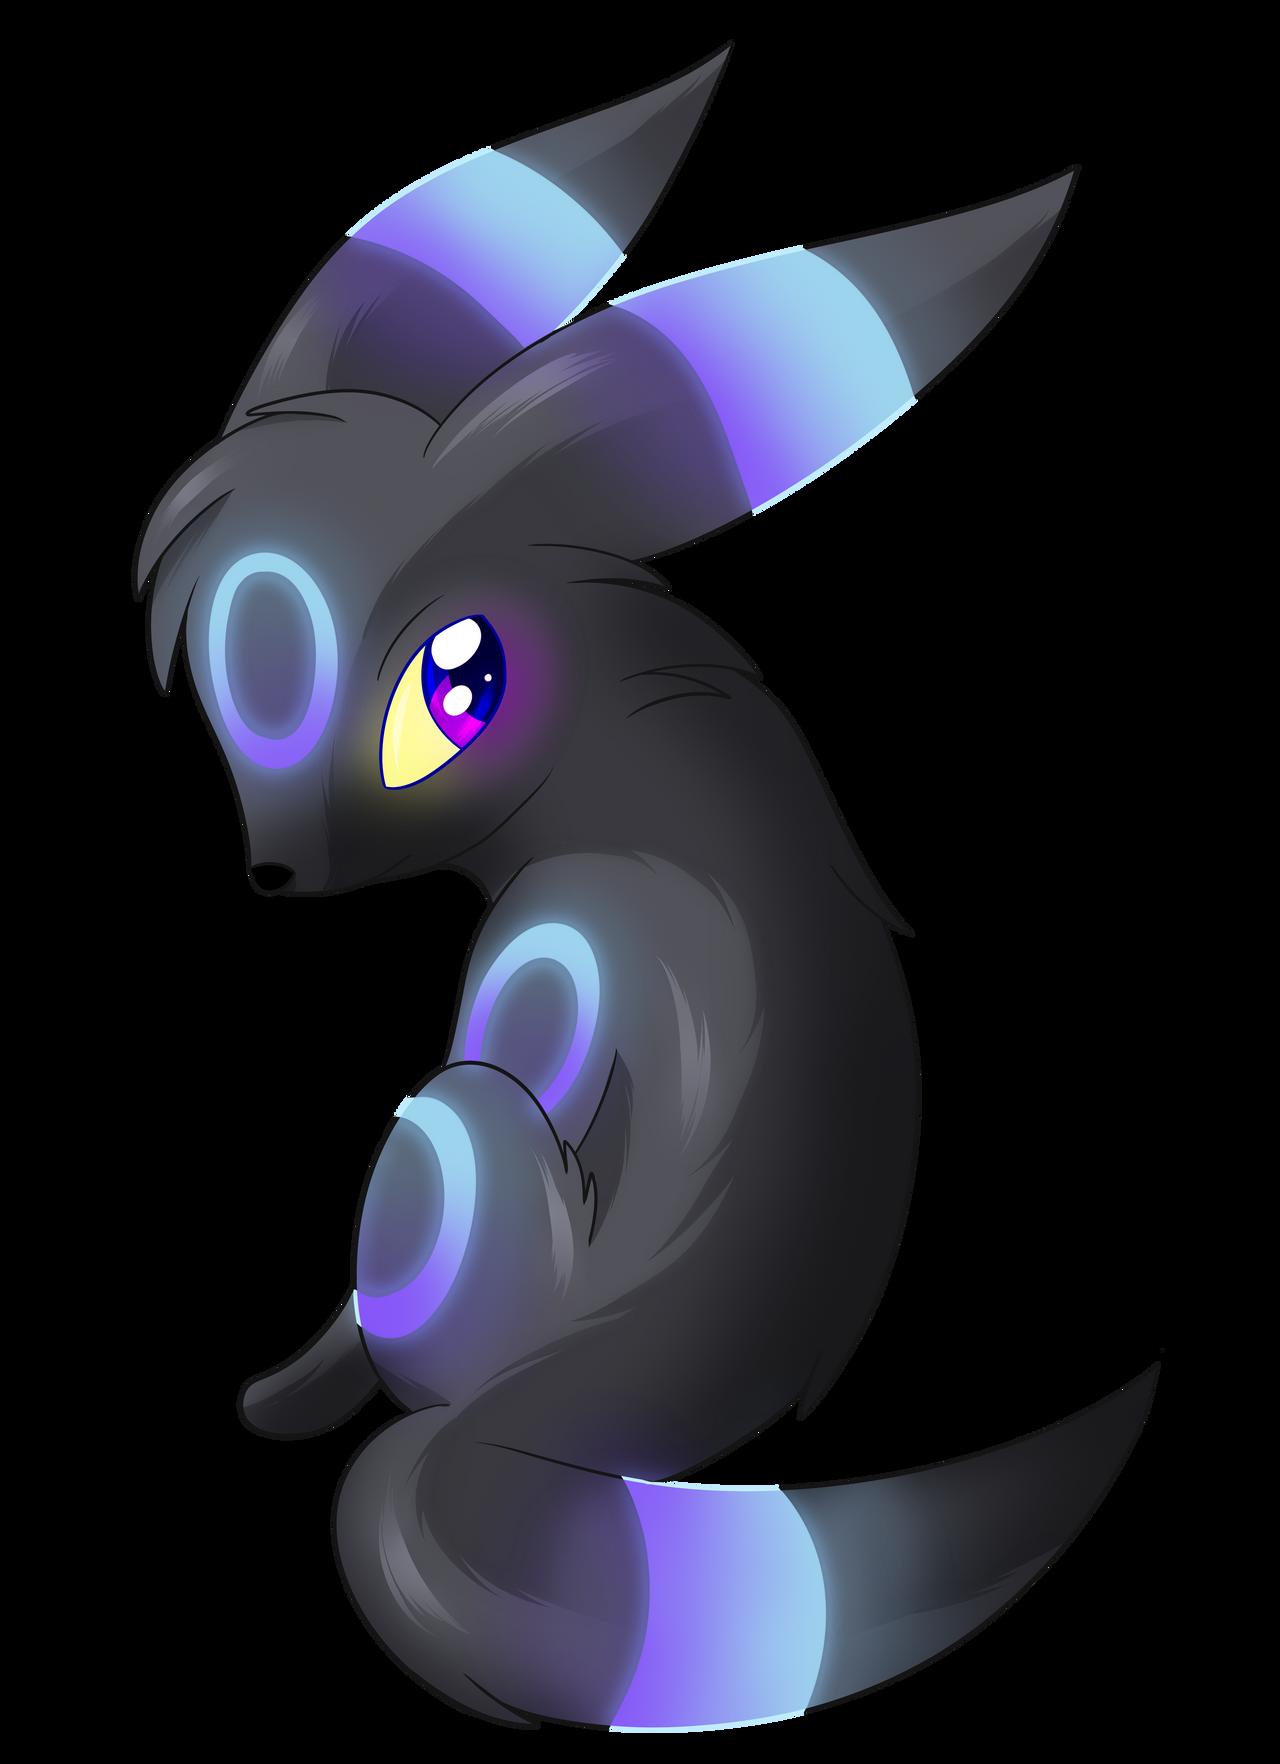 SN: Cute little moon fox by MoonRayCZ